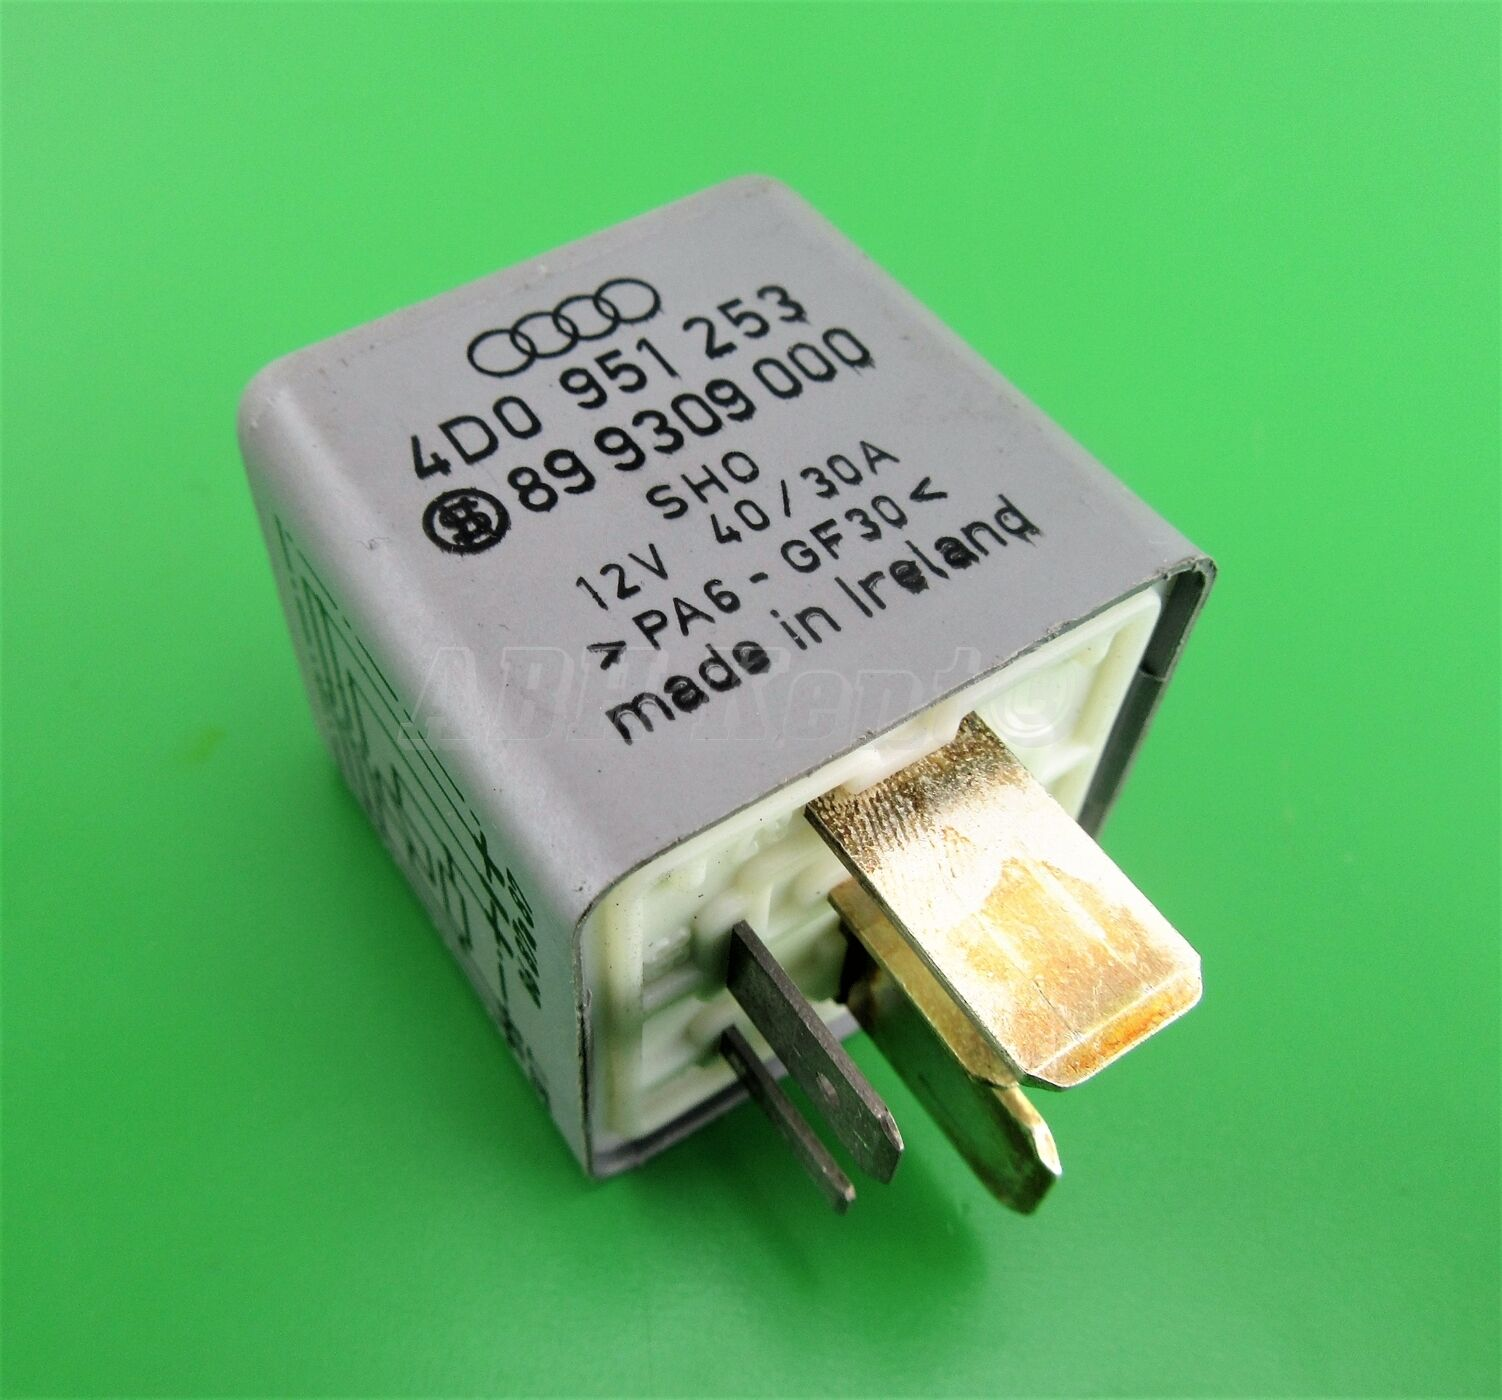 222 Audi Vw Grey 372 Fuel Pump 5pin Relay 4d0951253 Sho 899309000 40 5 Pin 2 Of 7